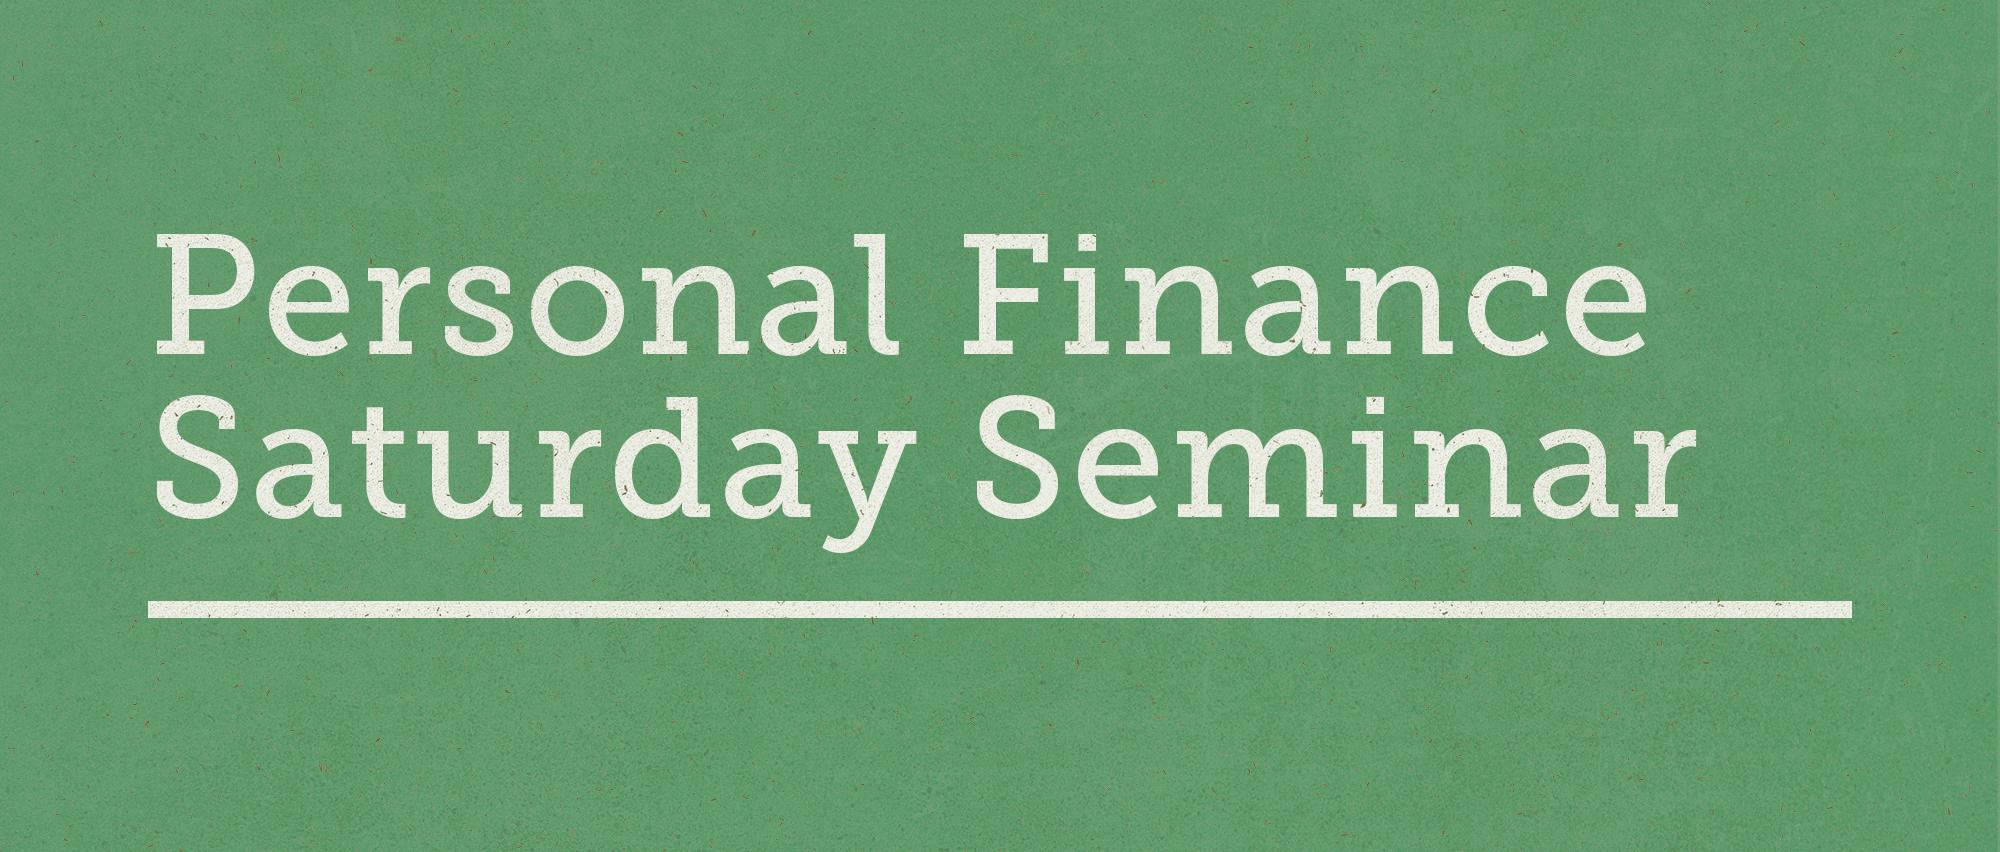 Personal Finance Saturday Seminar.jpg